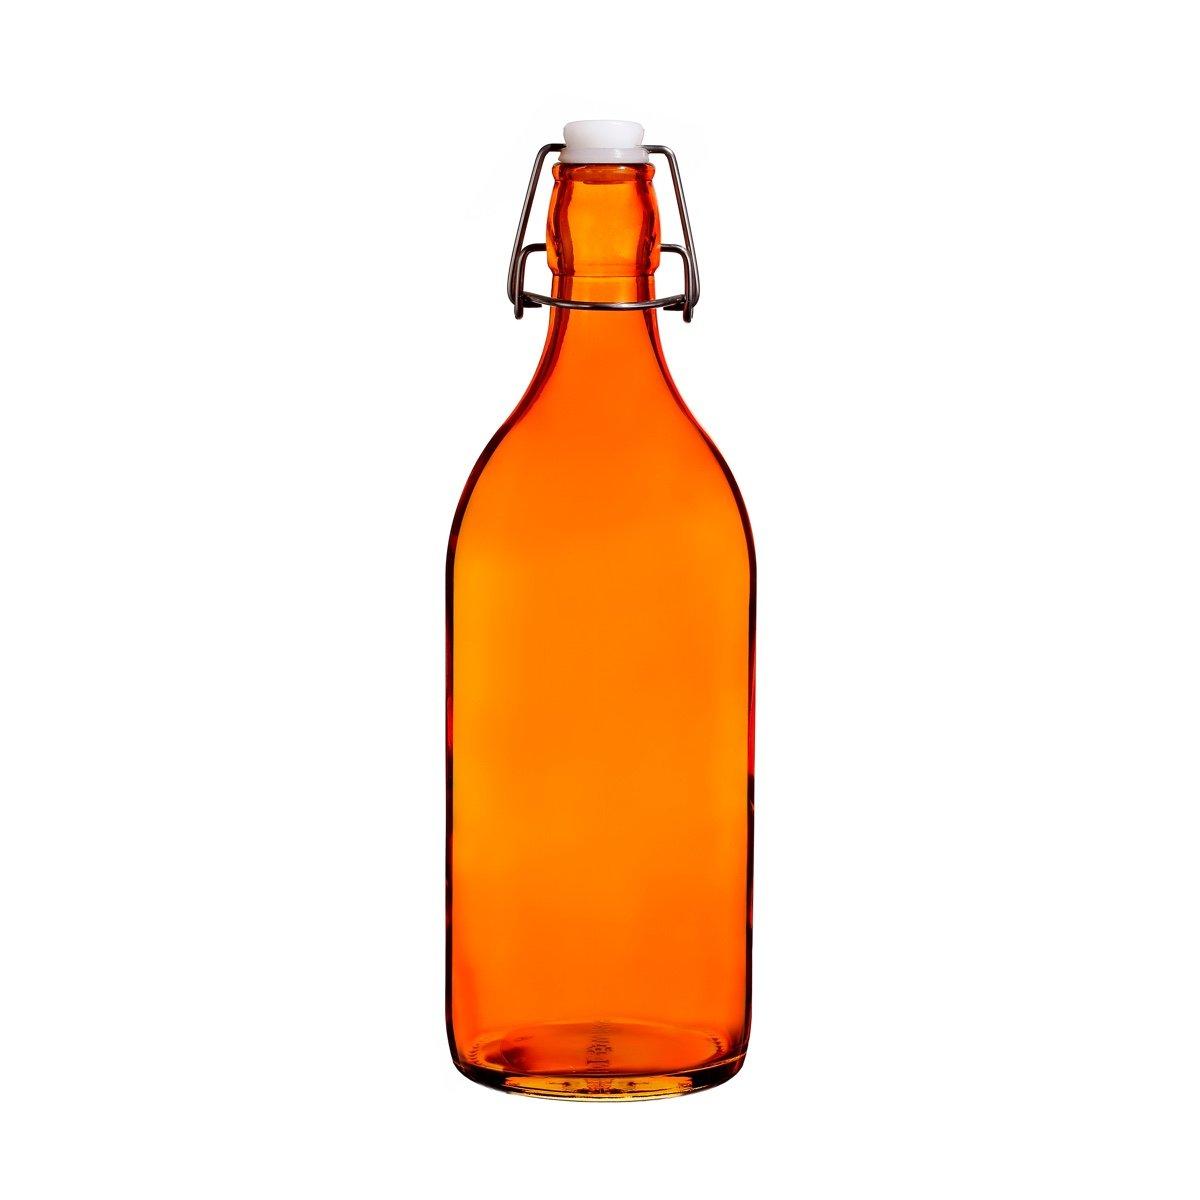 Colorful Reusable Glass Water Bottles With Swing Top Leakproof Cap, 1L / 34oz, Flowersea Glasss Water Bottle for Oil, Vinegar, Beverages, Beer, Water, Kombucha, Kefir, Soda (Orange, Round)